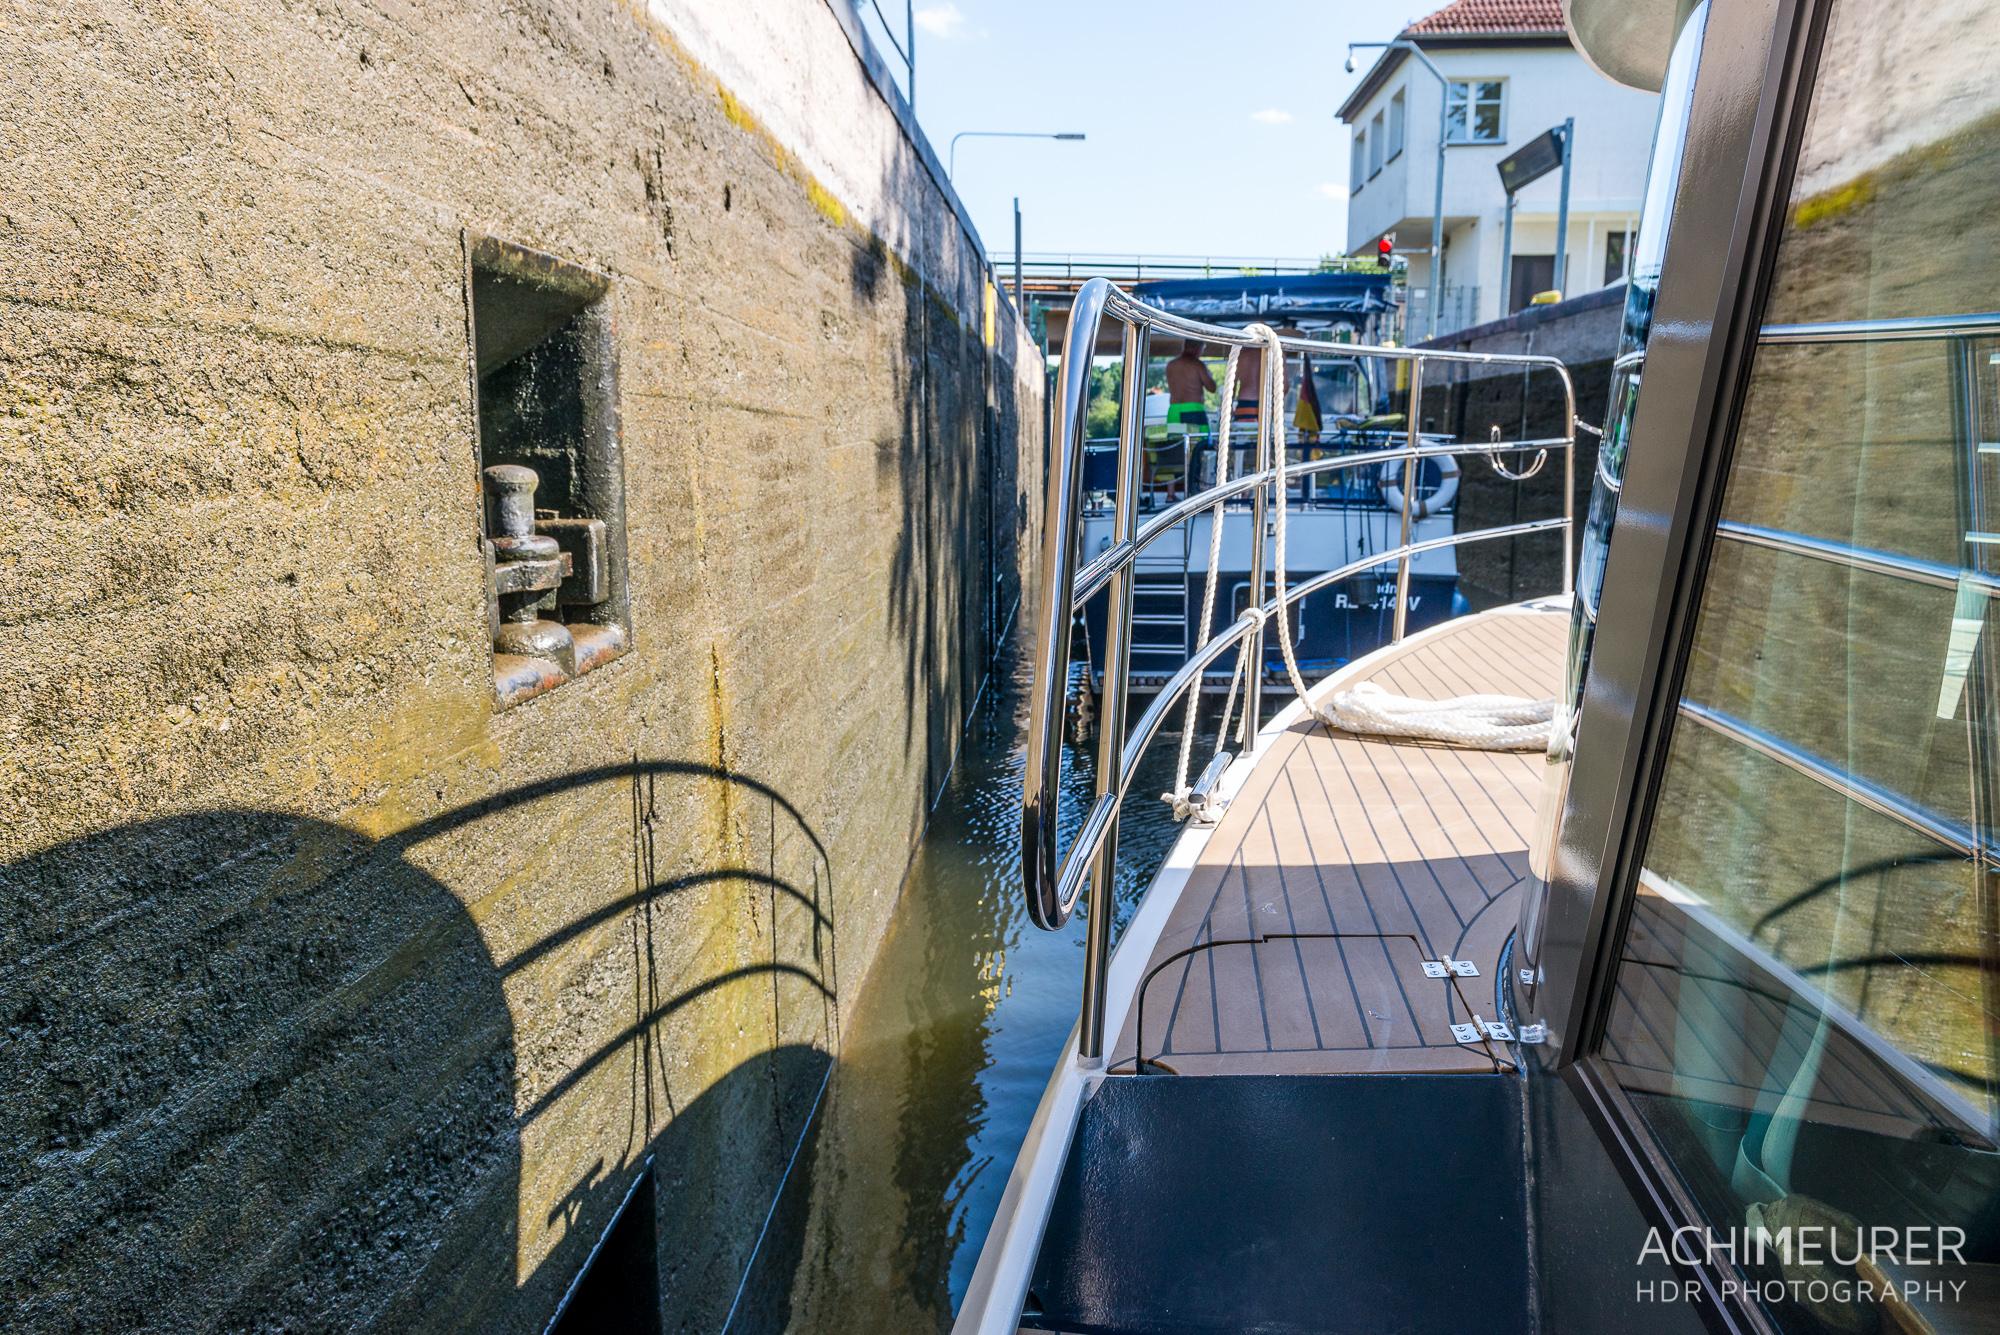 Hausboot-Kuhnle-Mueritz-Mecklenburg-Vorpommern-See_3277